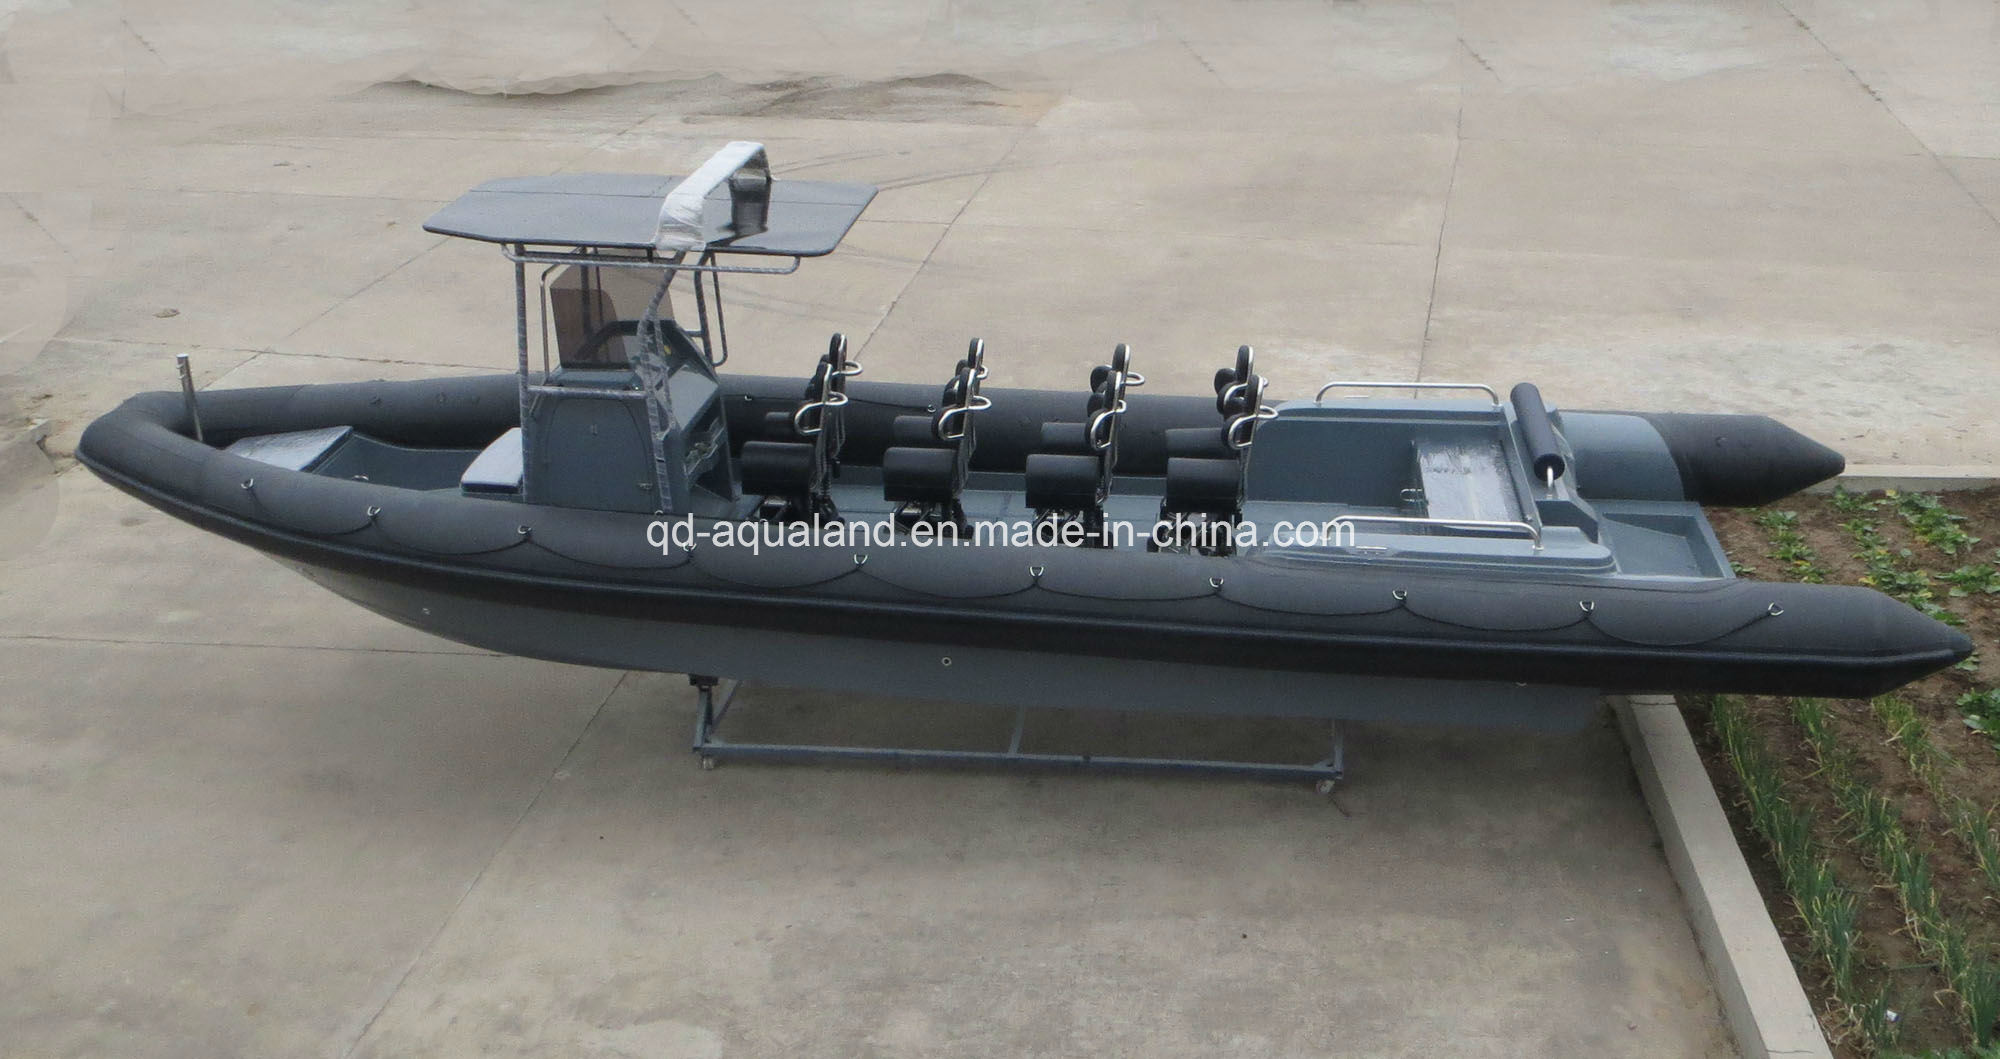 China Aqualand 36feet 11m Rigid Inflatable Motor Boat/Rib Patrol Boat/Rescue/Diving/Military Boat (RIB1050)